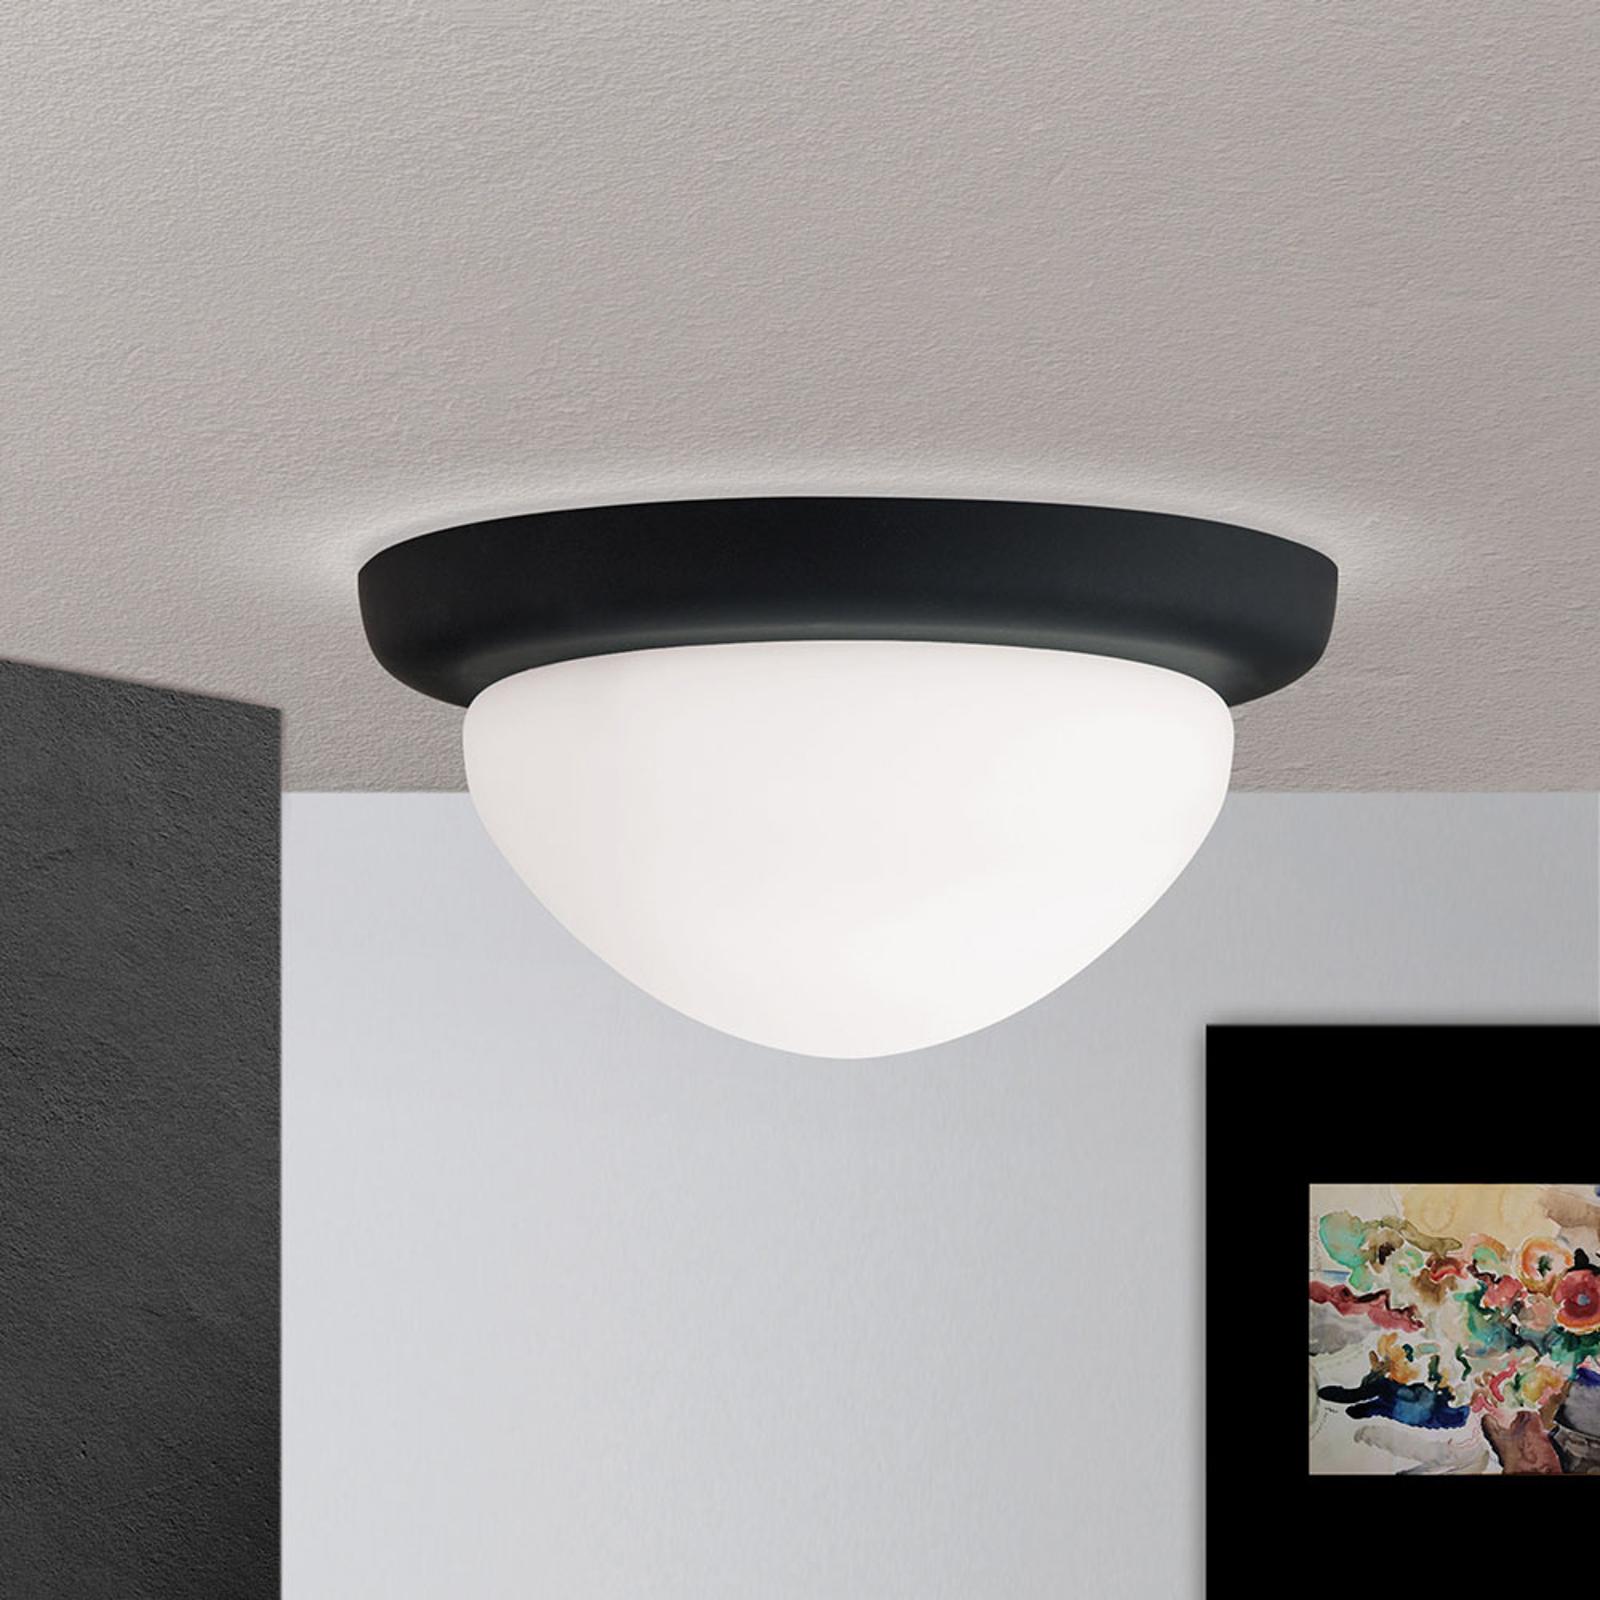 Taklampe Classico, svart/hvit, Ø 22 cm